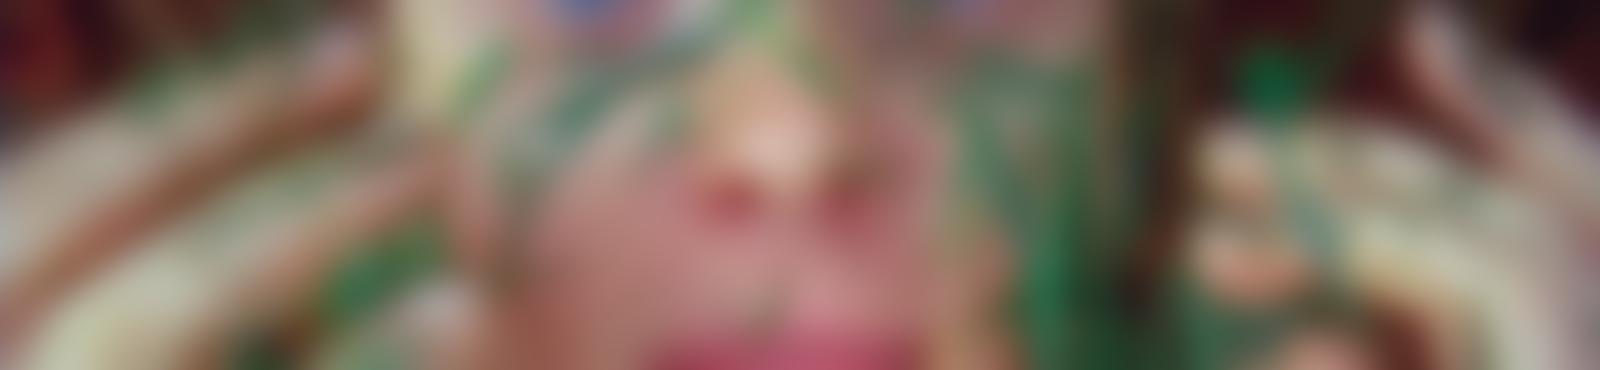 Blurred 154a2389 1958 494a 98ab b64869c4424c